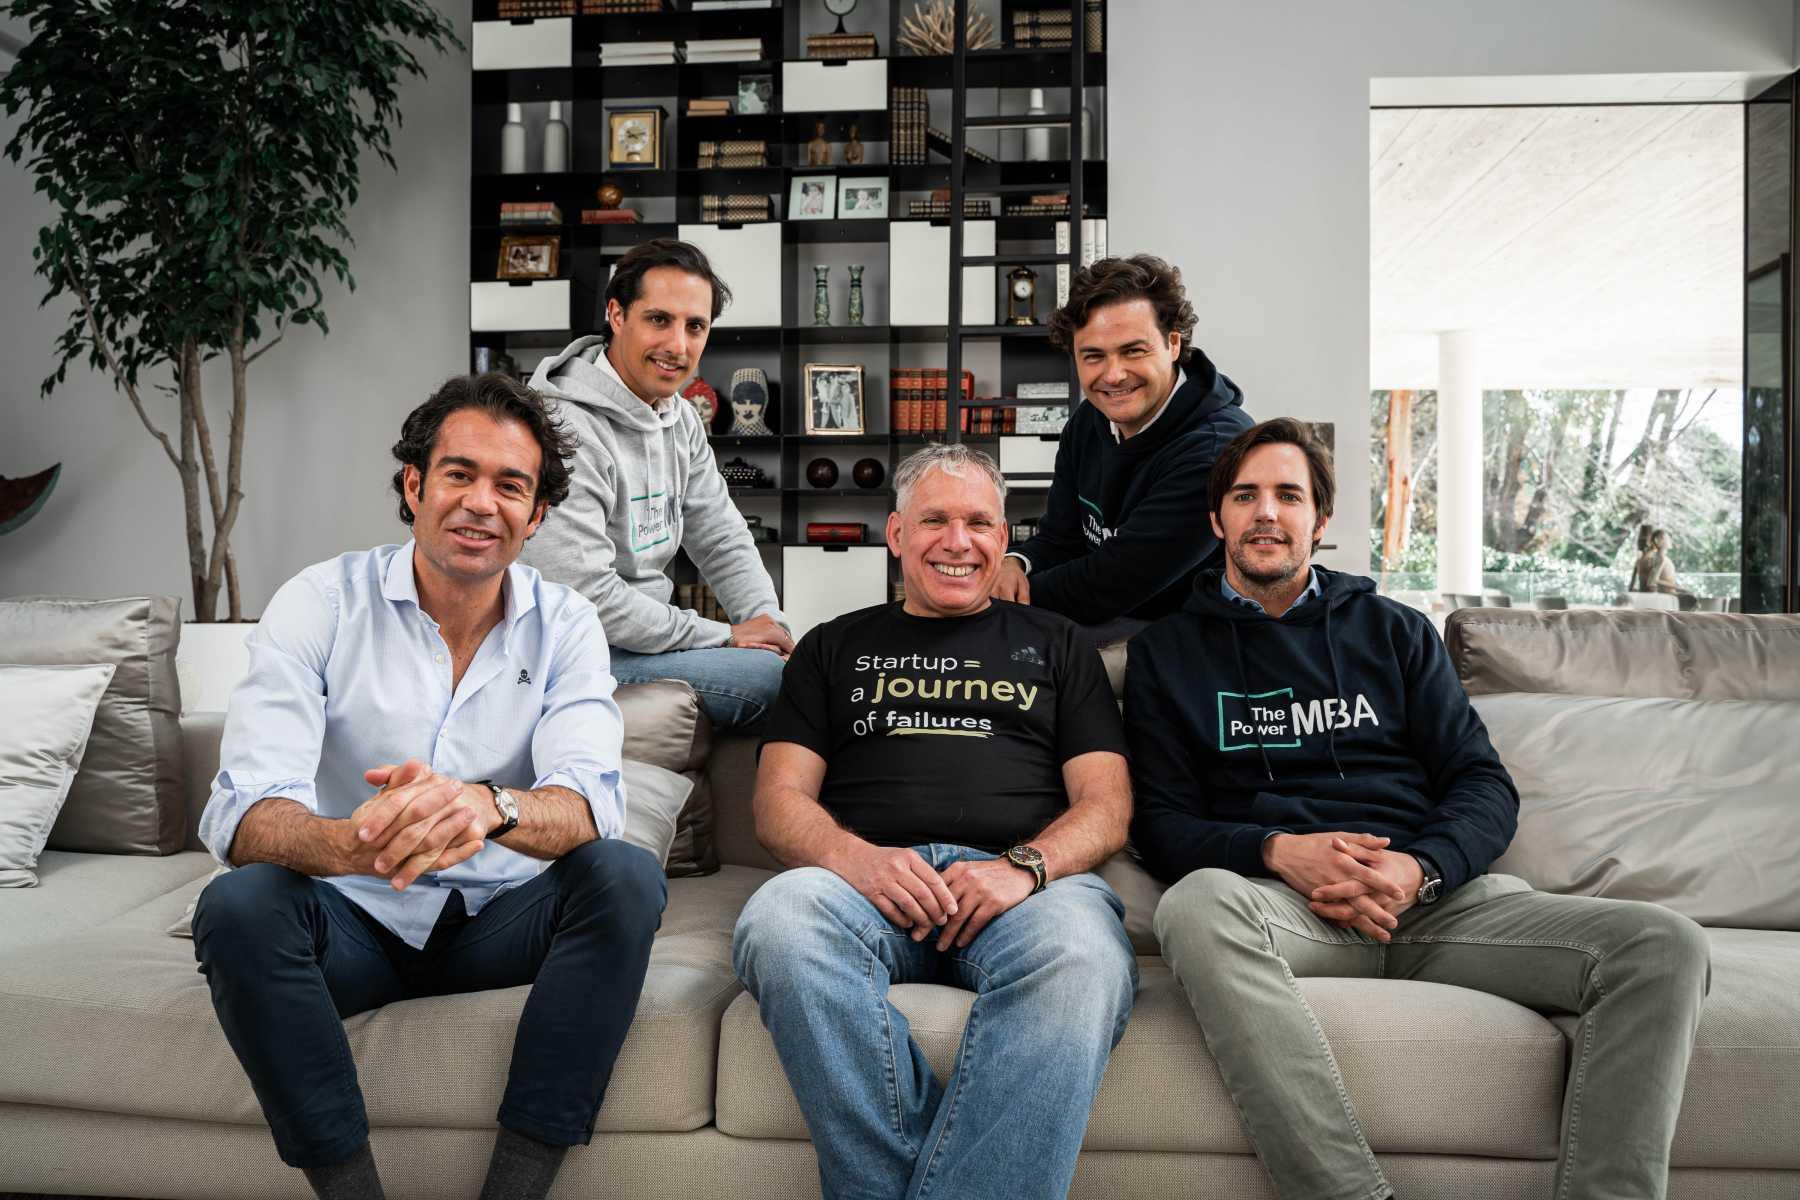 fundadores thepowermba con uri levine